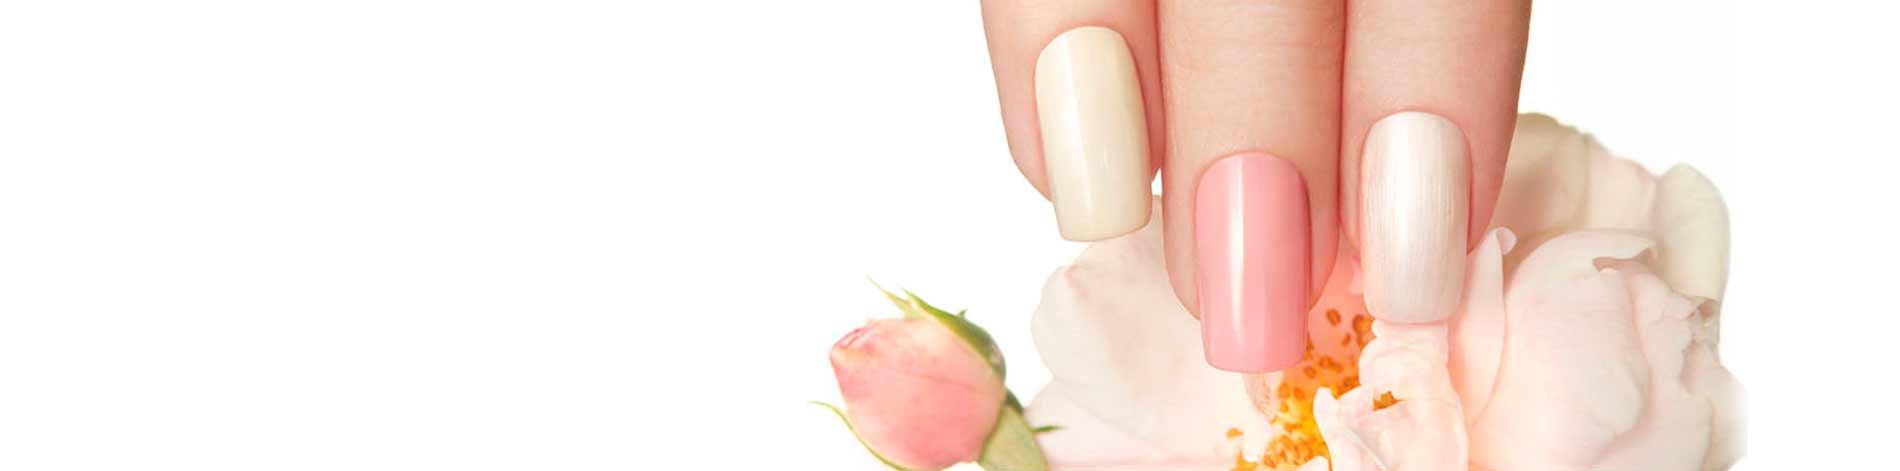 Rondebosch Beauty Clinic